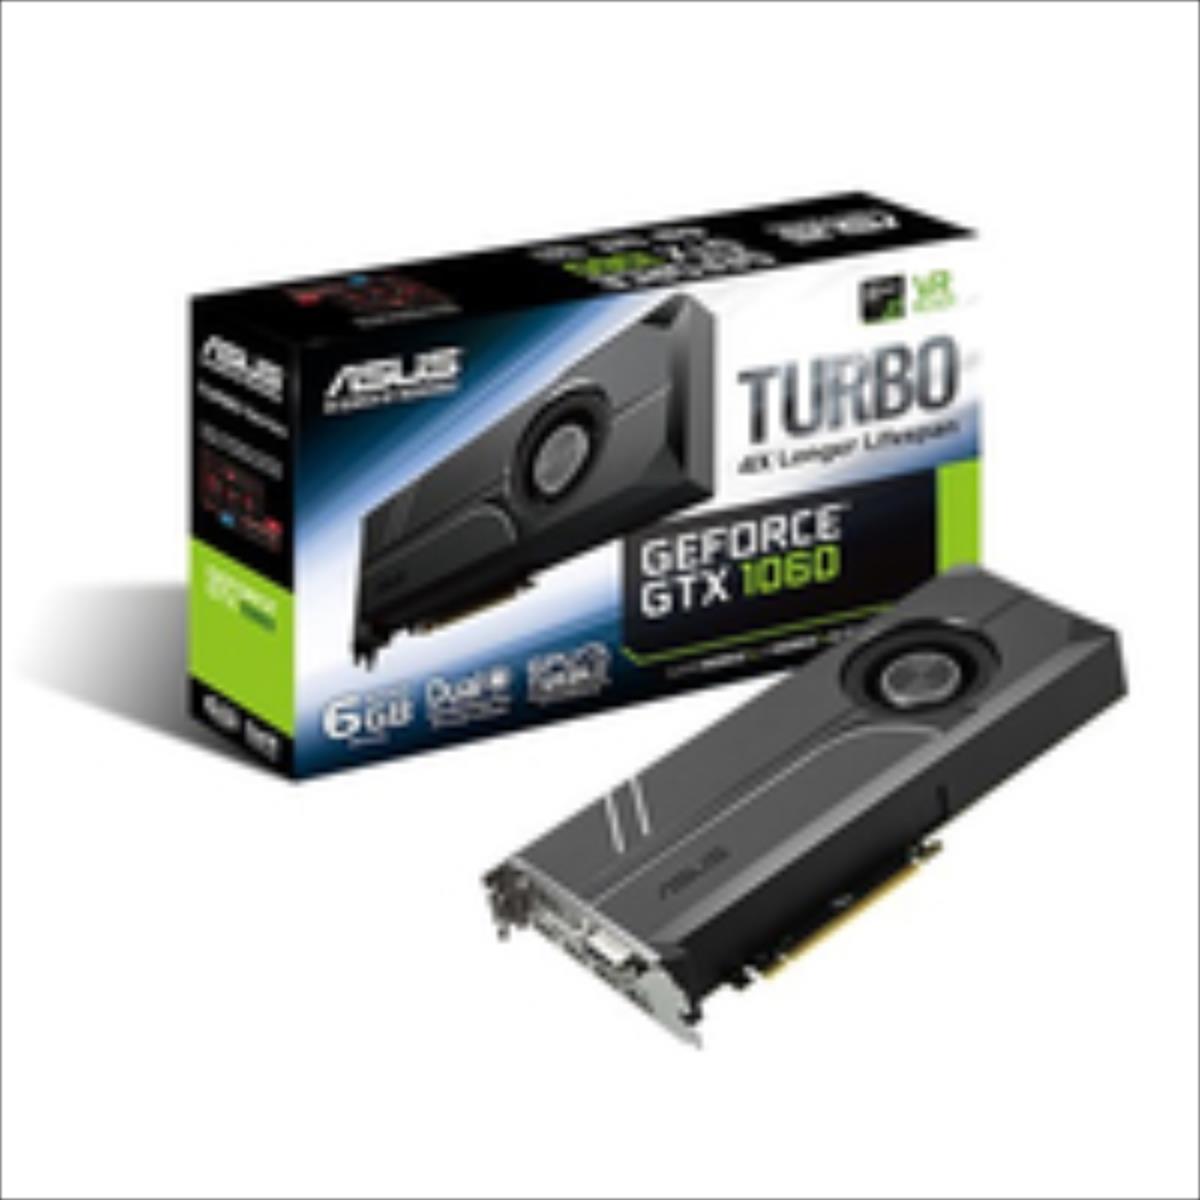 ASUS Turbo-GTX1060-6G video karte